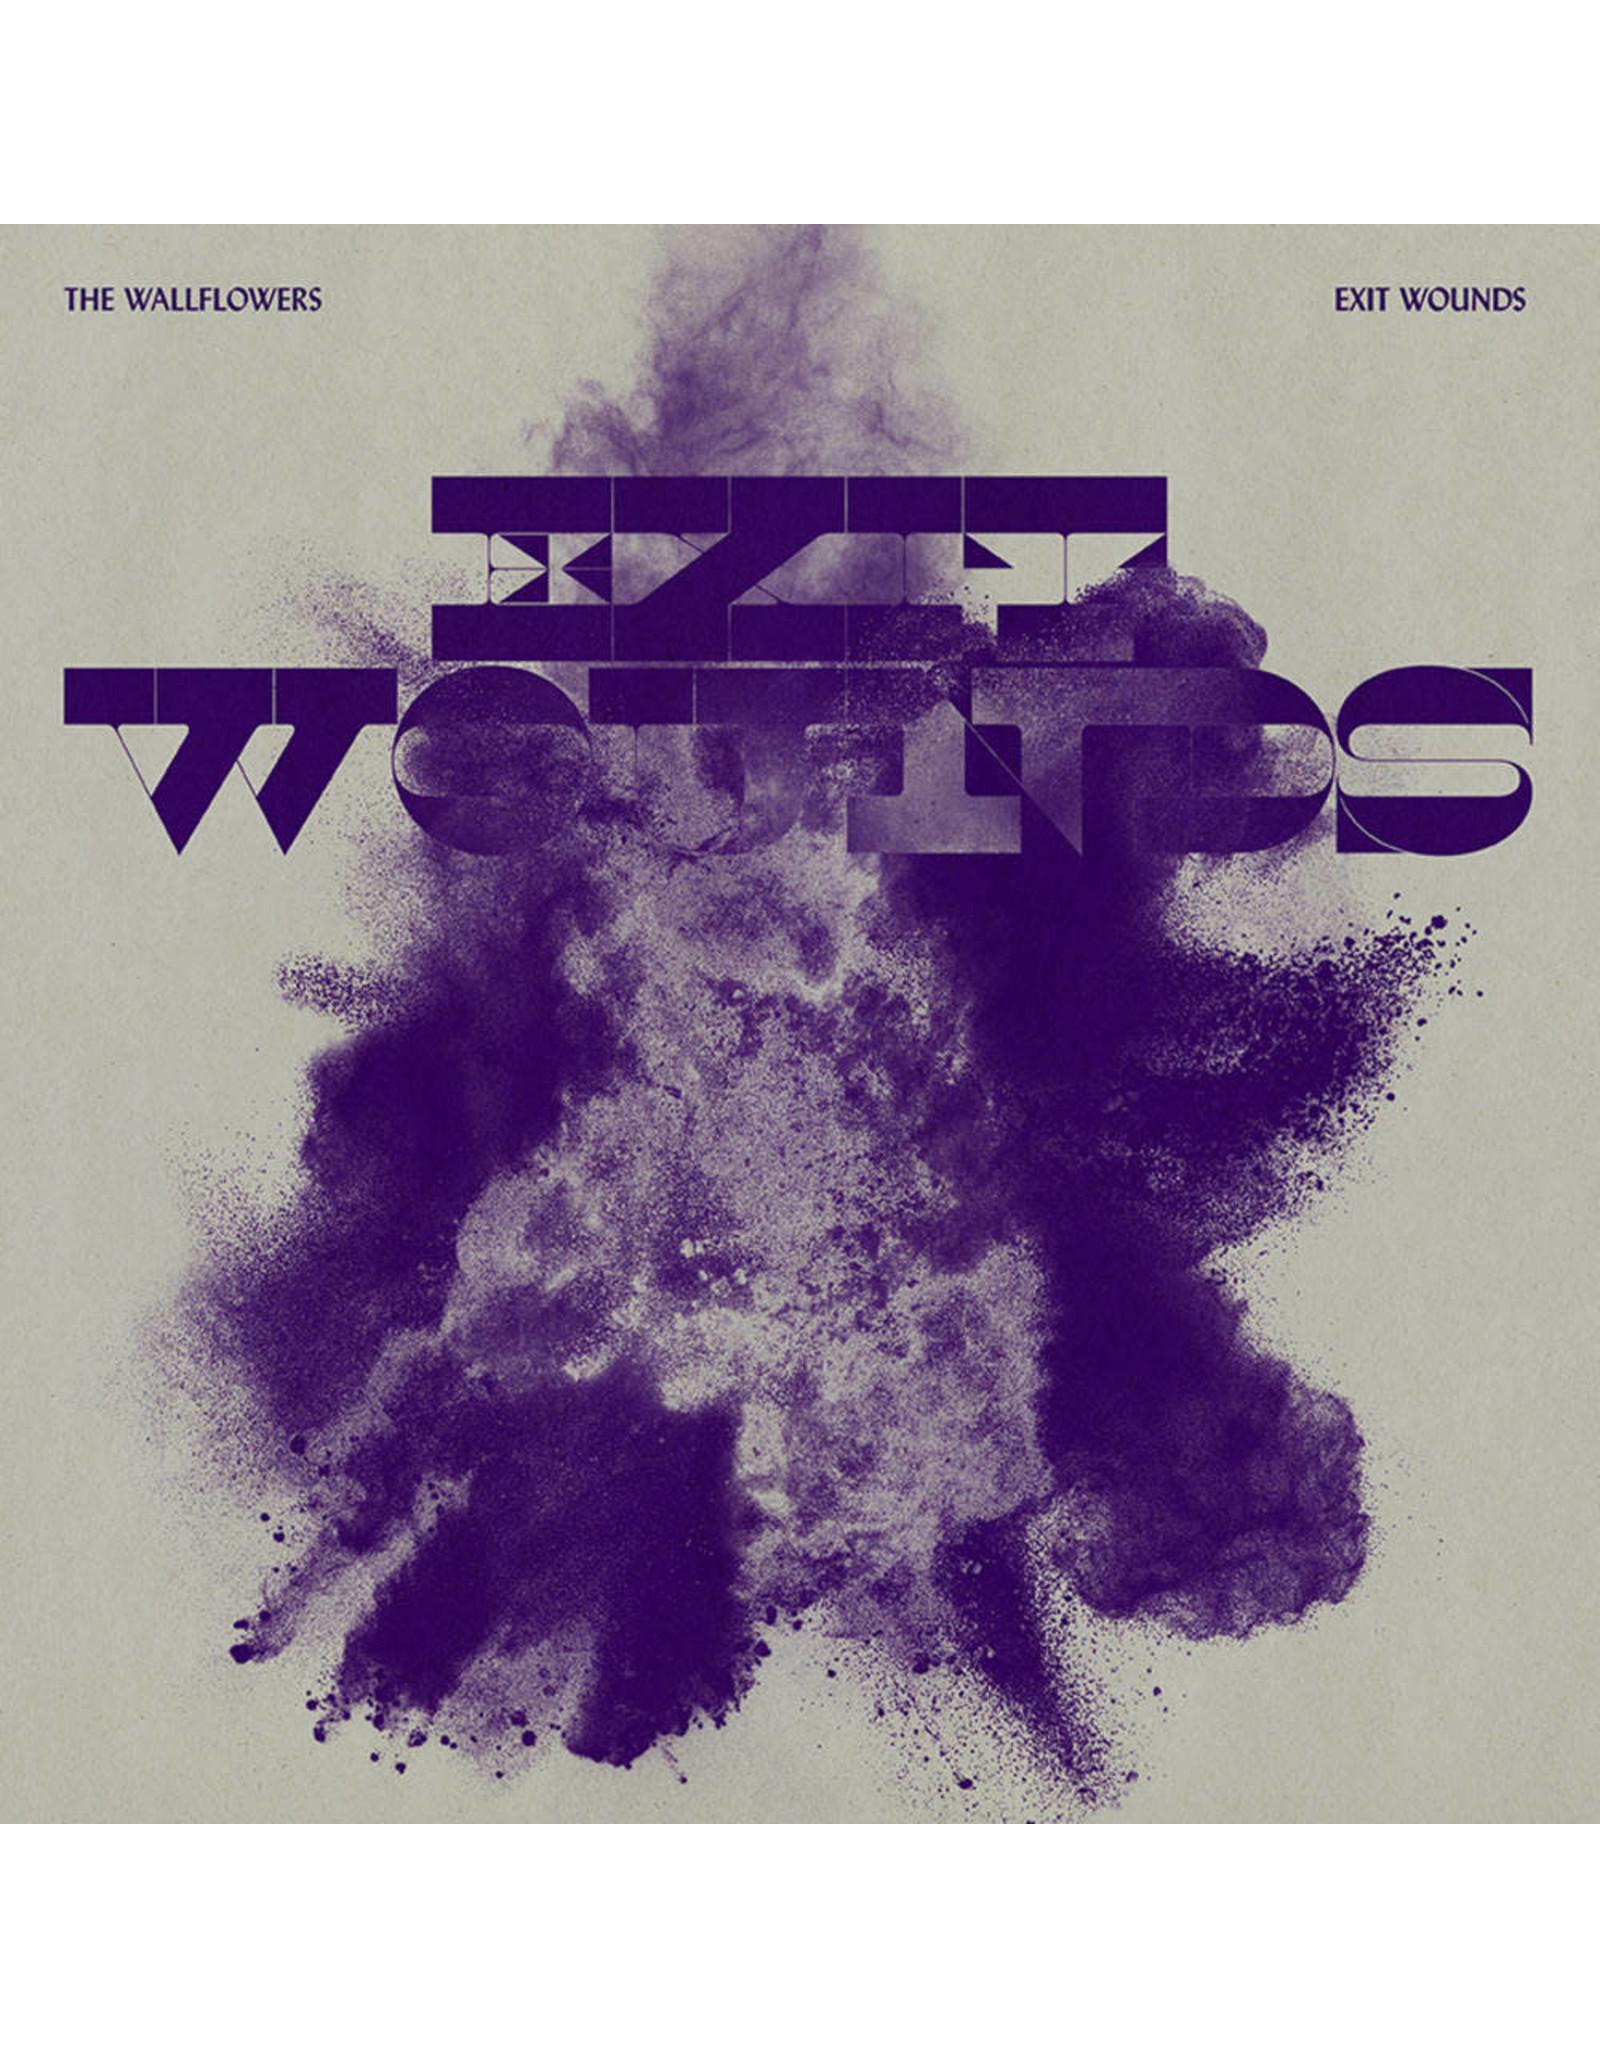 Wallflowers - Exit Wounds (Exclusive Purple Vinyl)